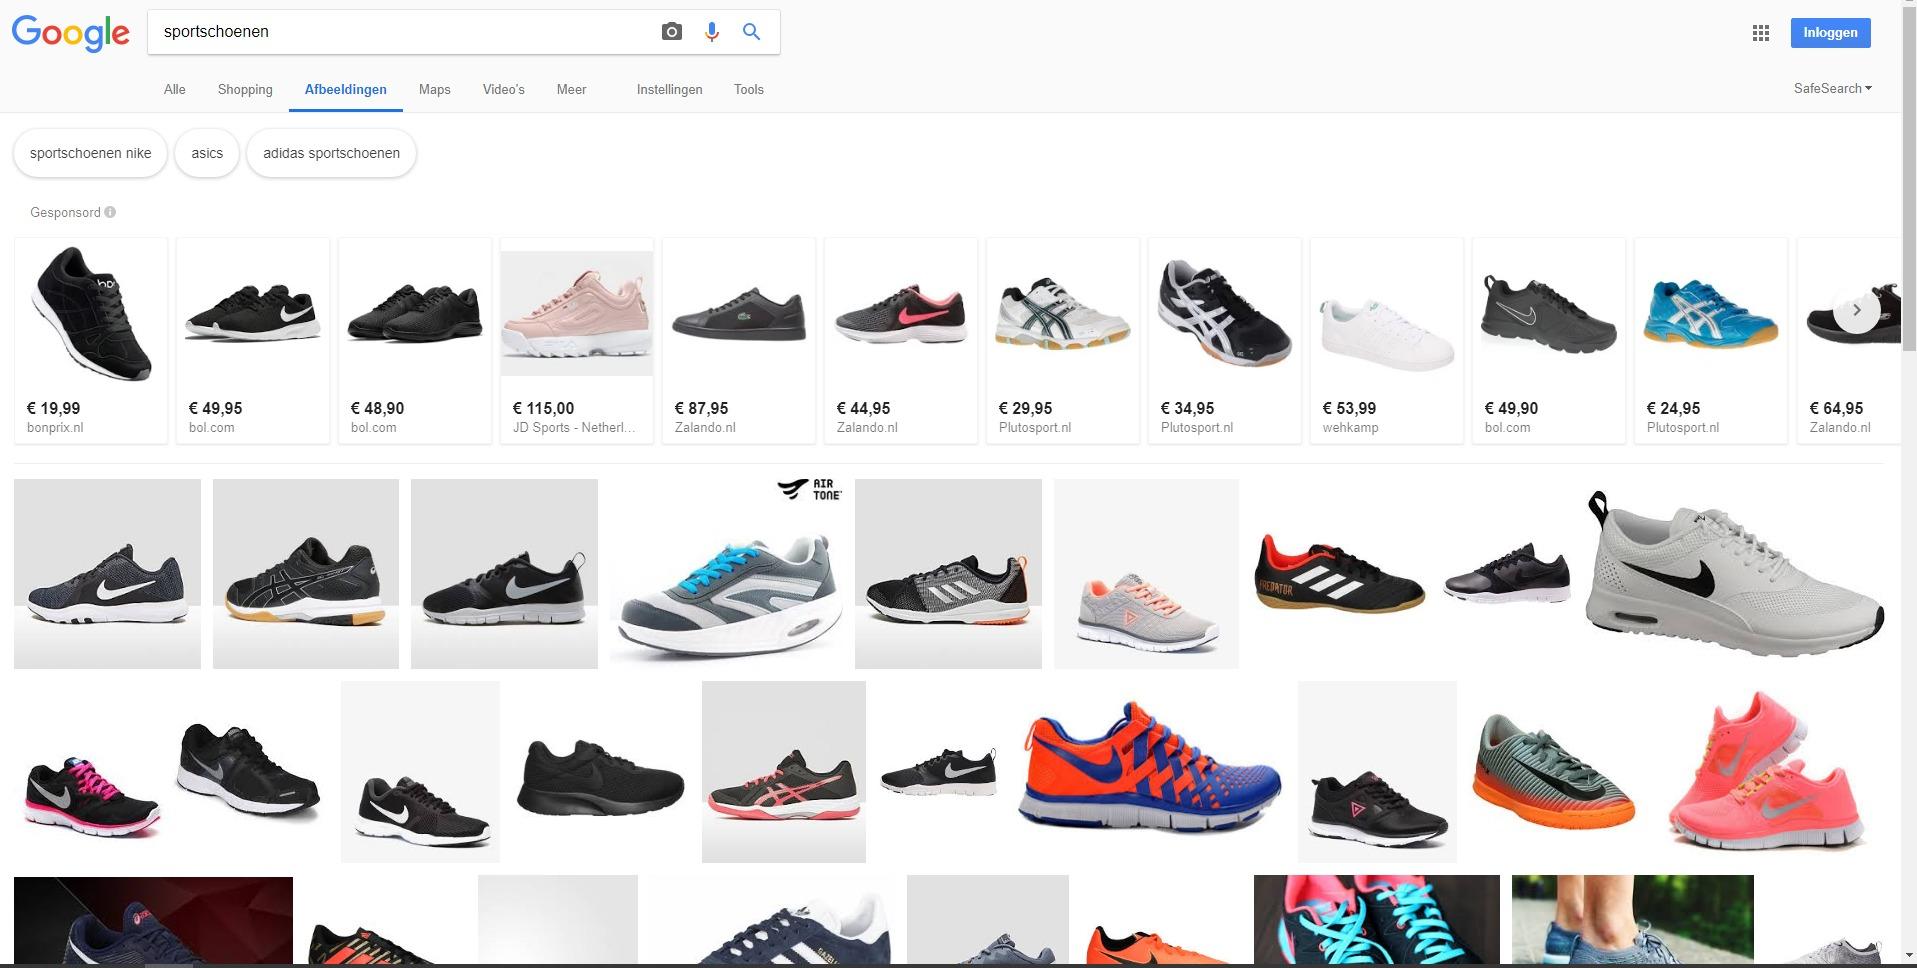 Online Marketing Nieuws week 37 - Shopping in Google Image Search